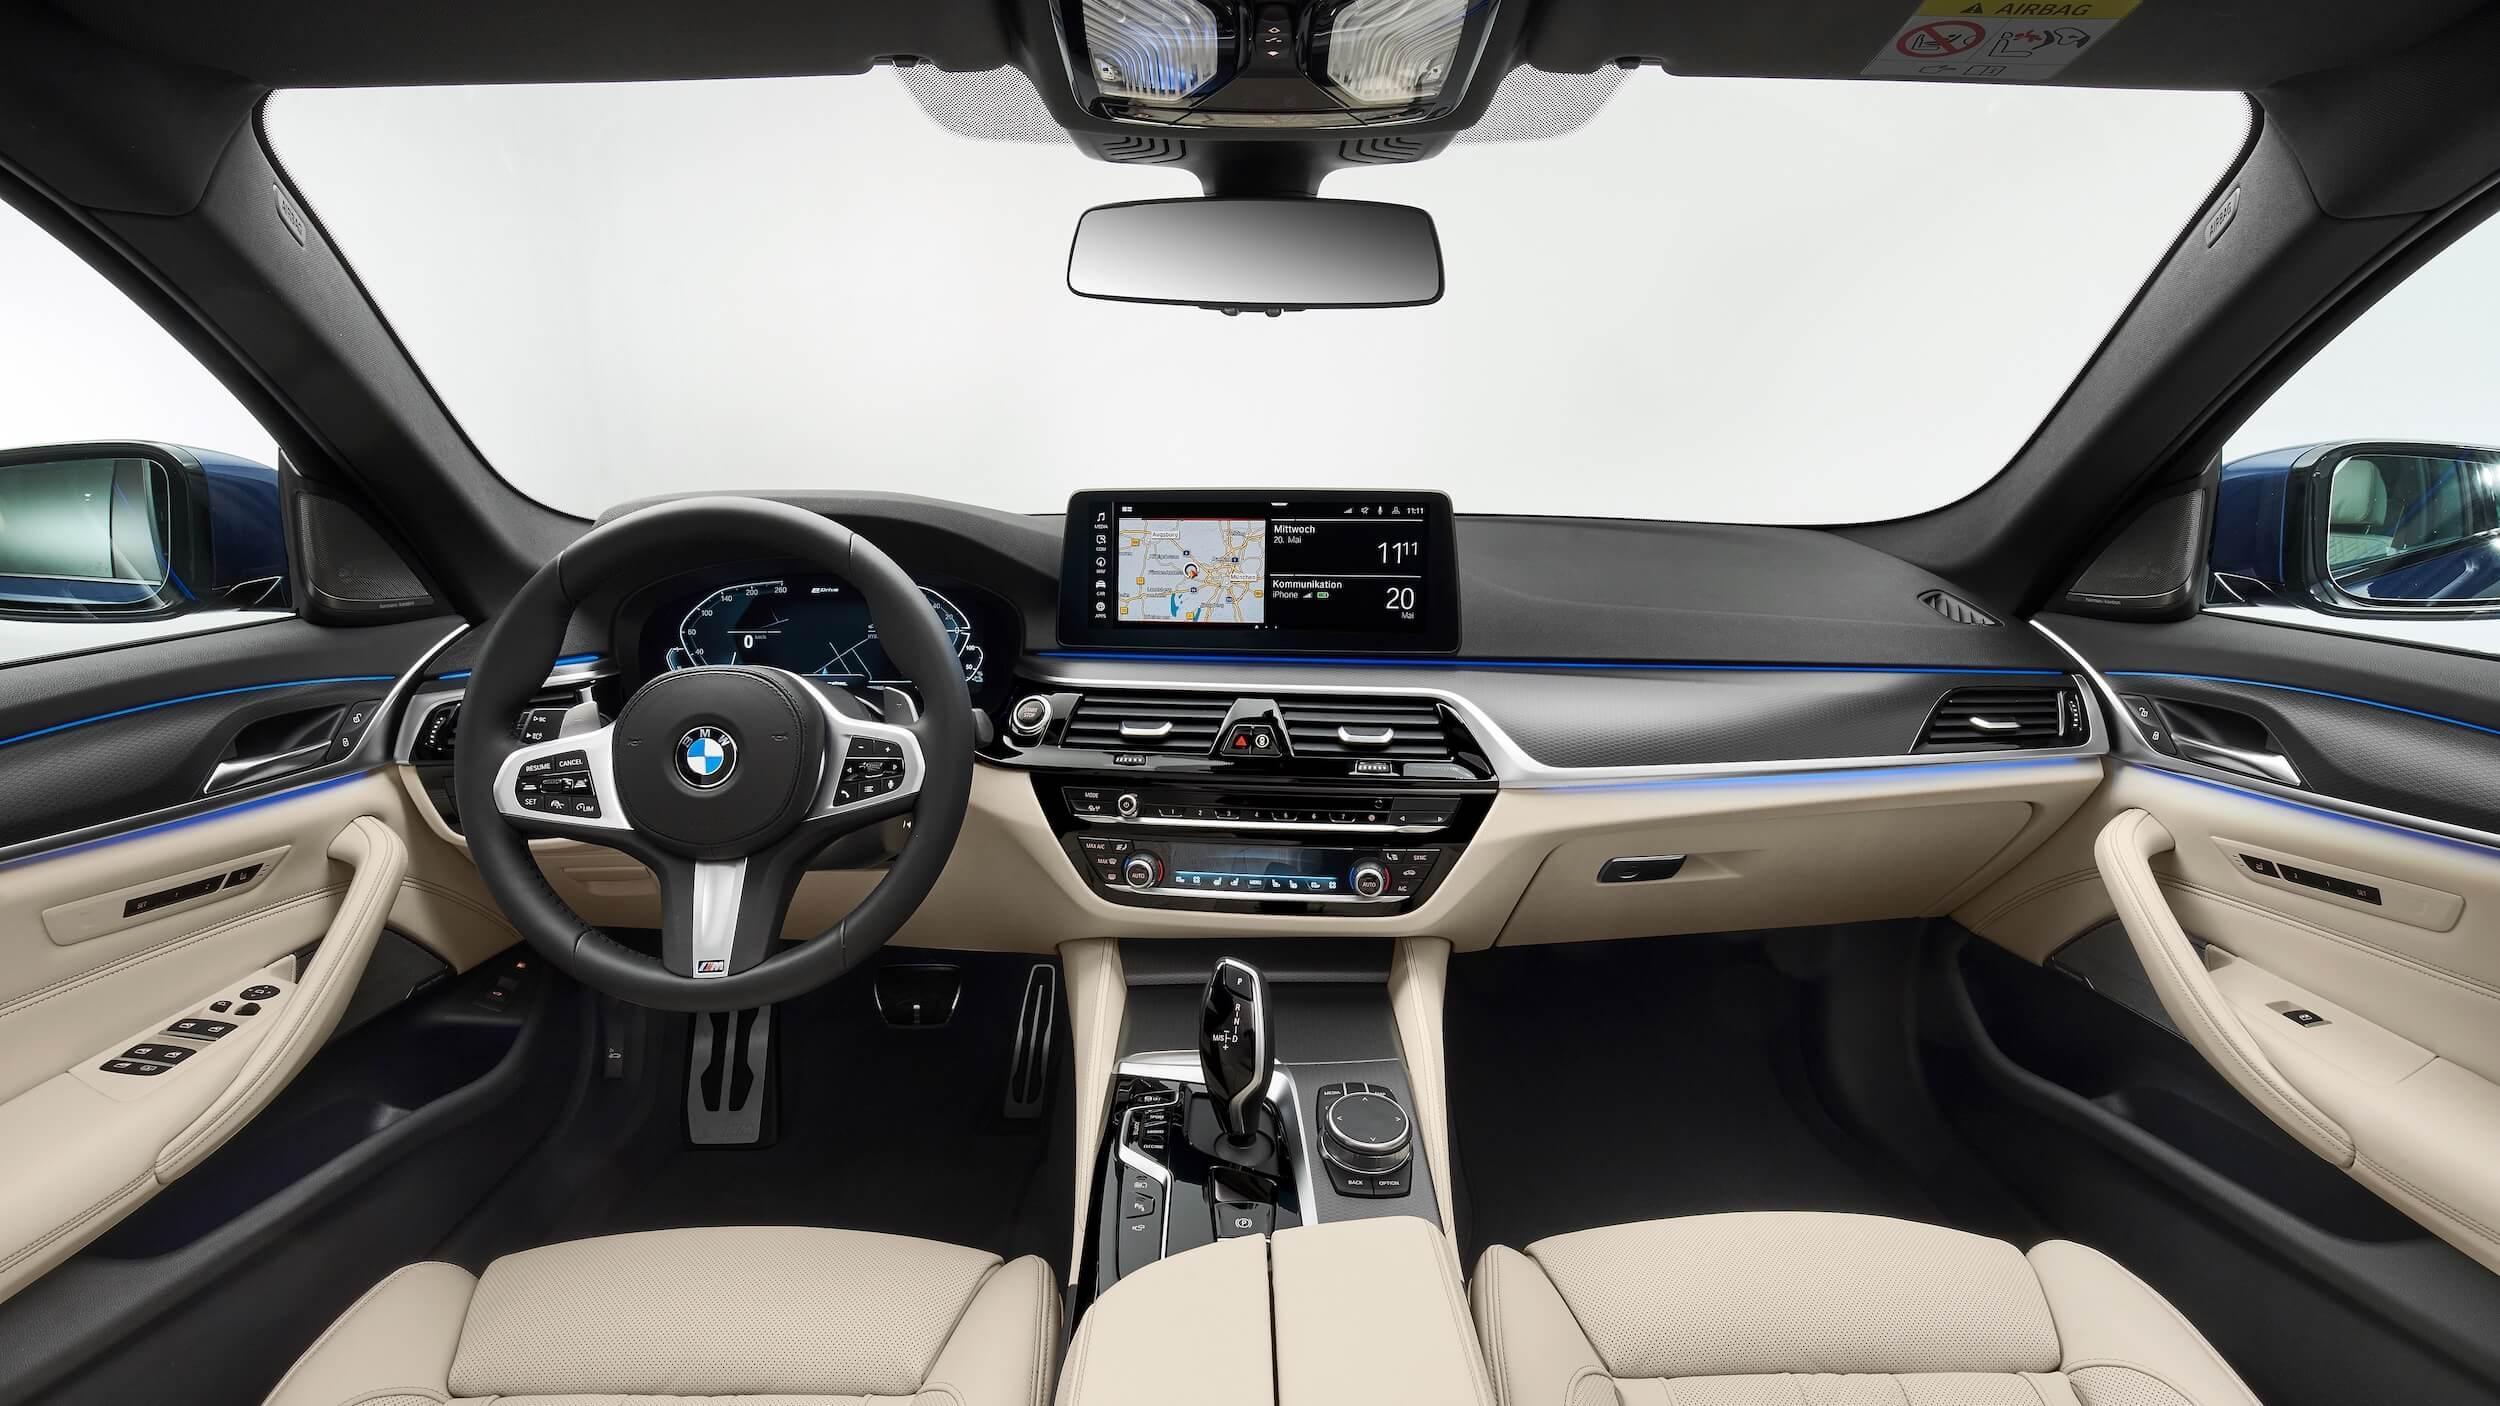 BMW 530e G30 facelift dashboard